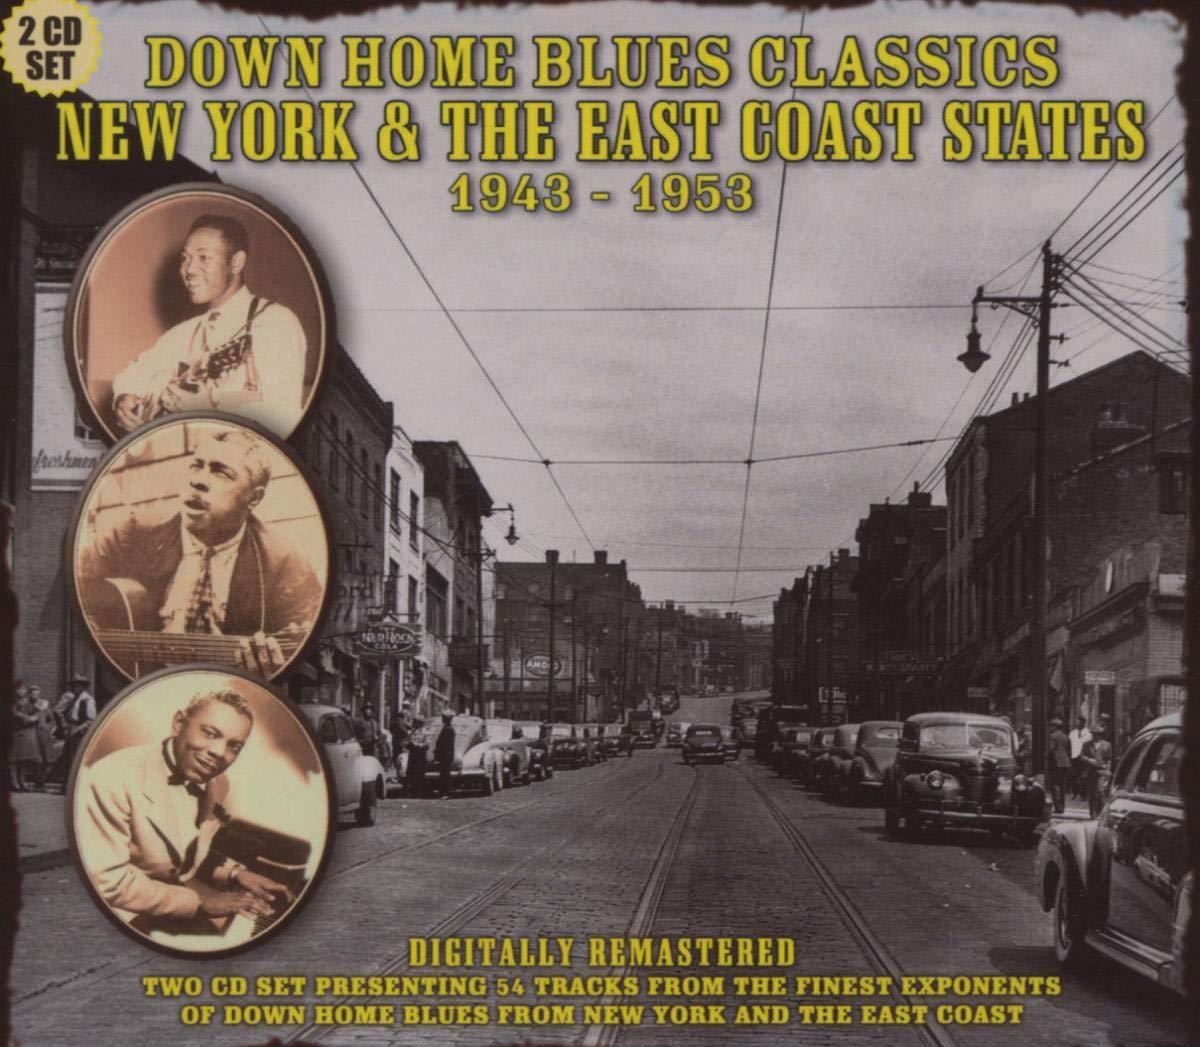 Down Home Blues Classics New York & East Coast